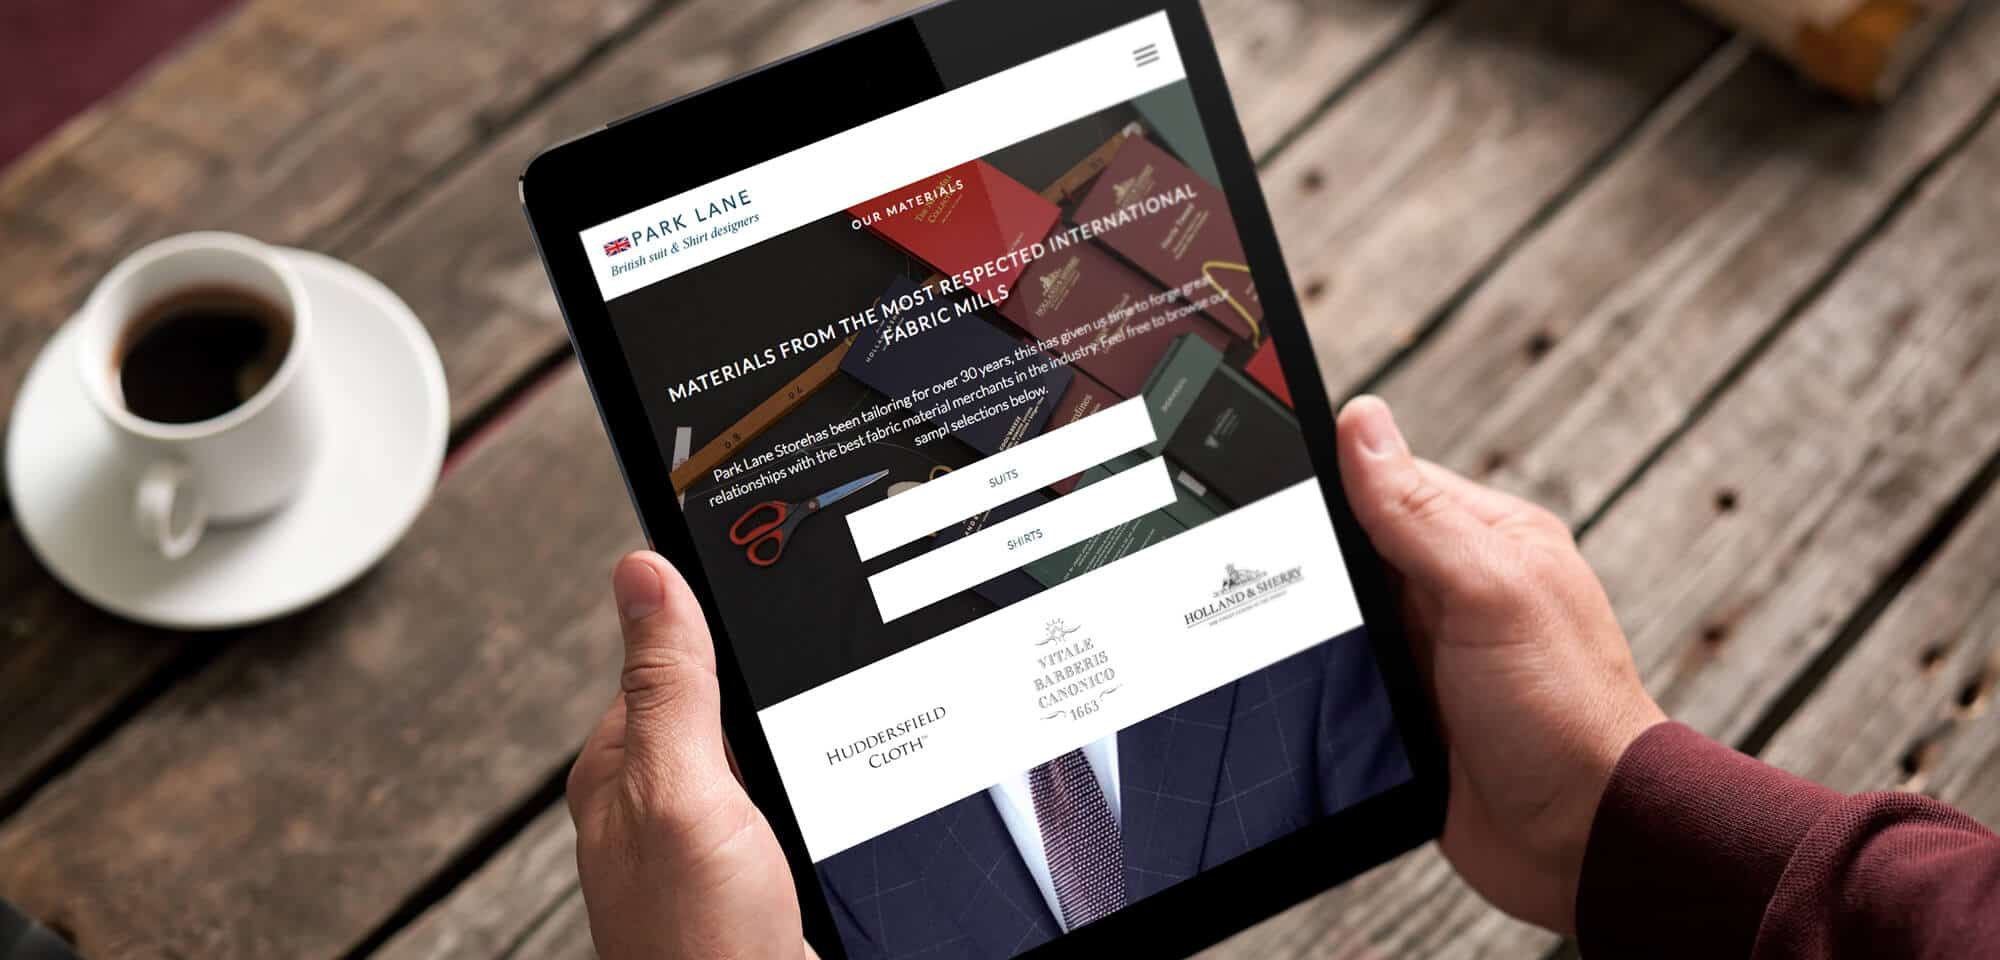 website-design-tailors-park-lane-store-ipad-view